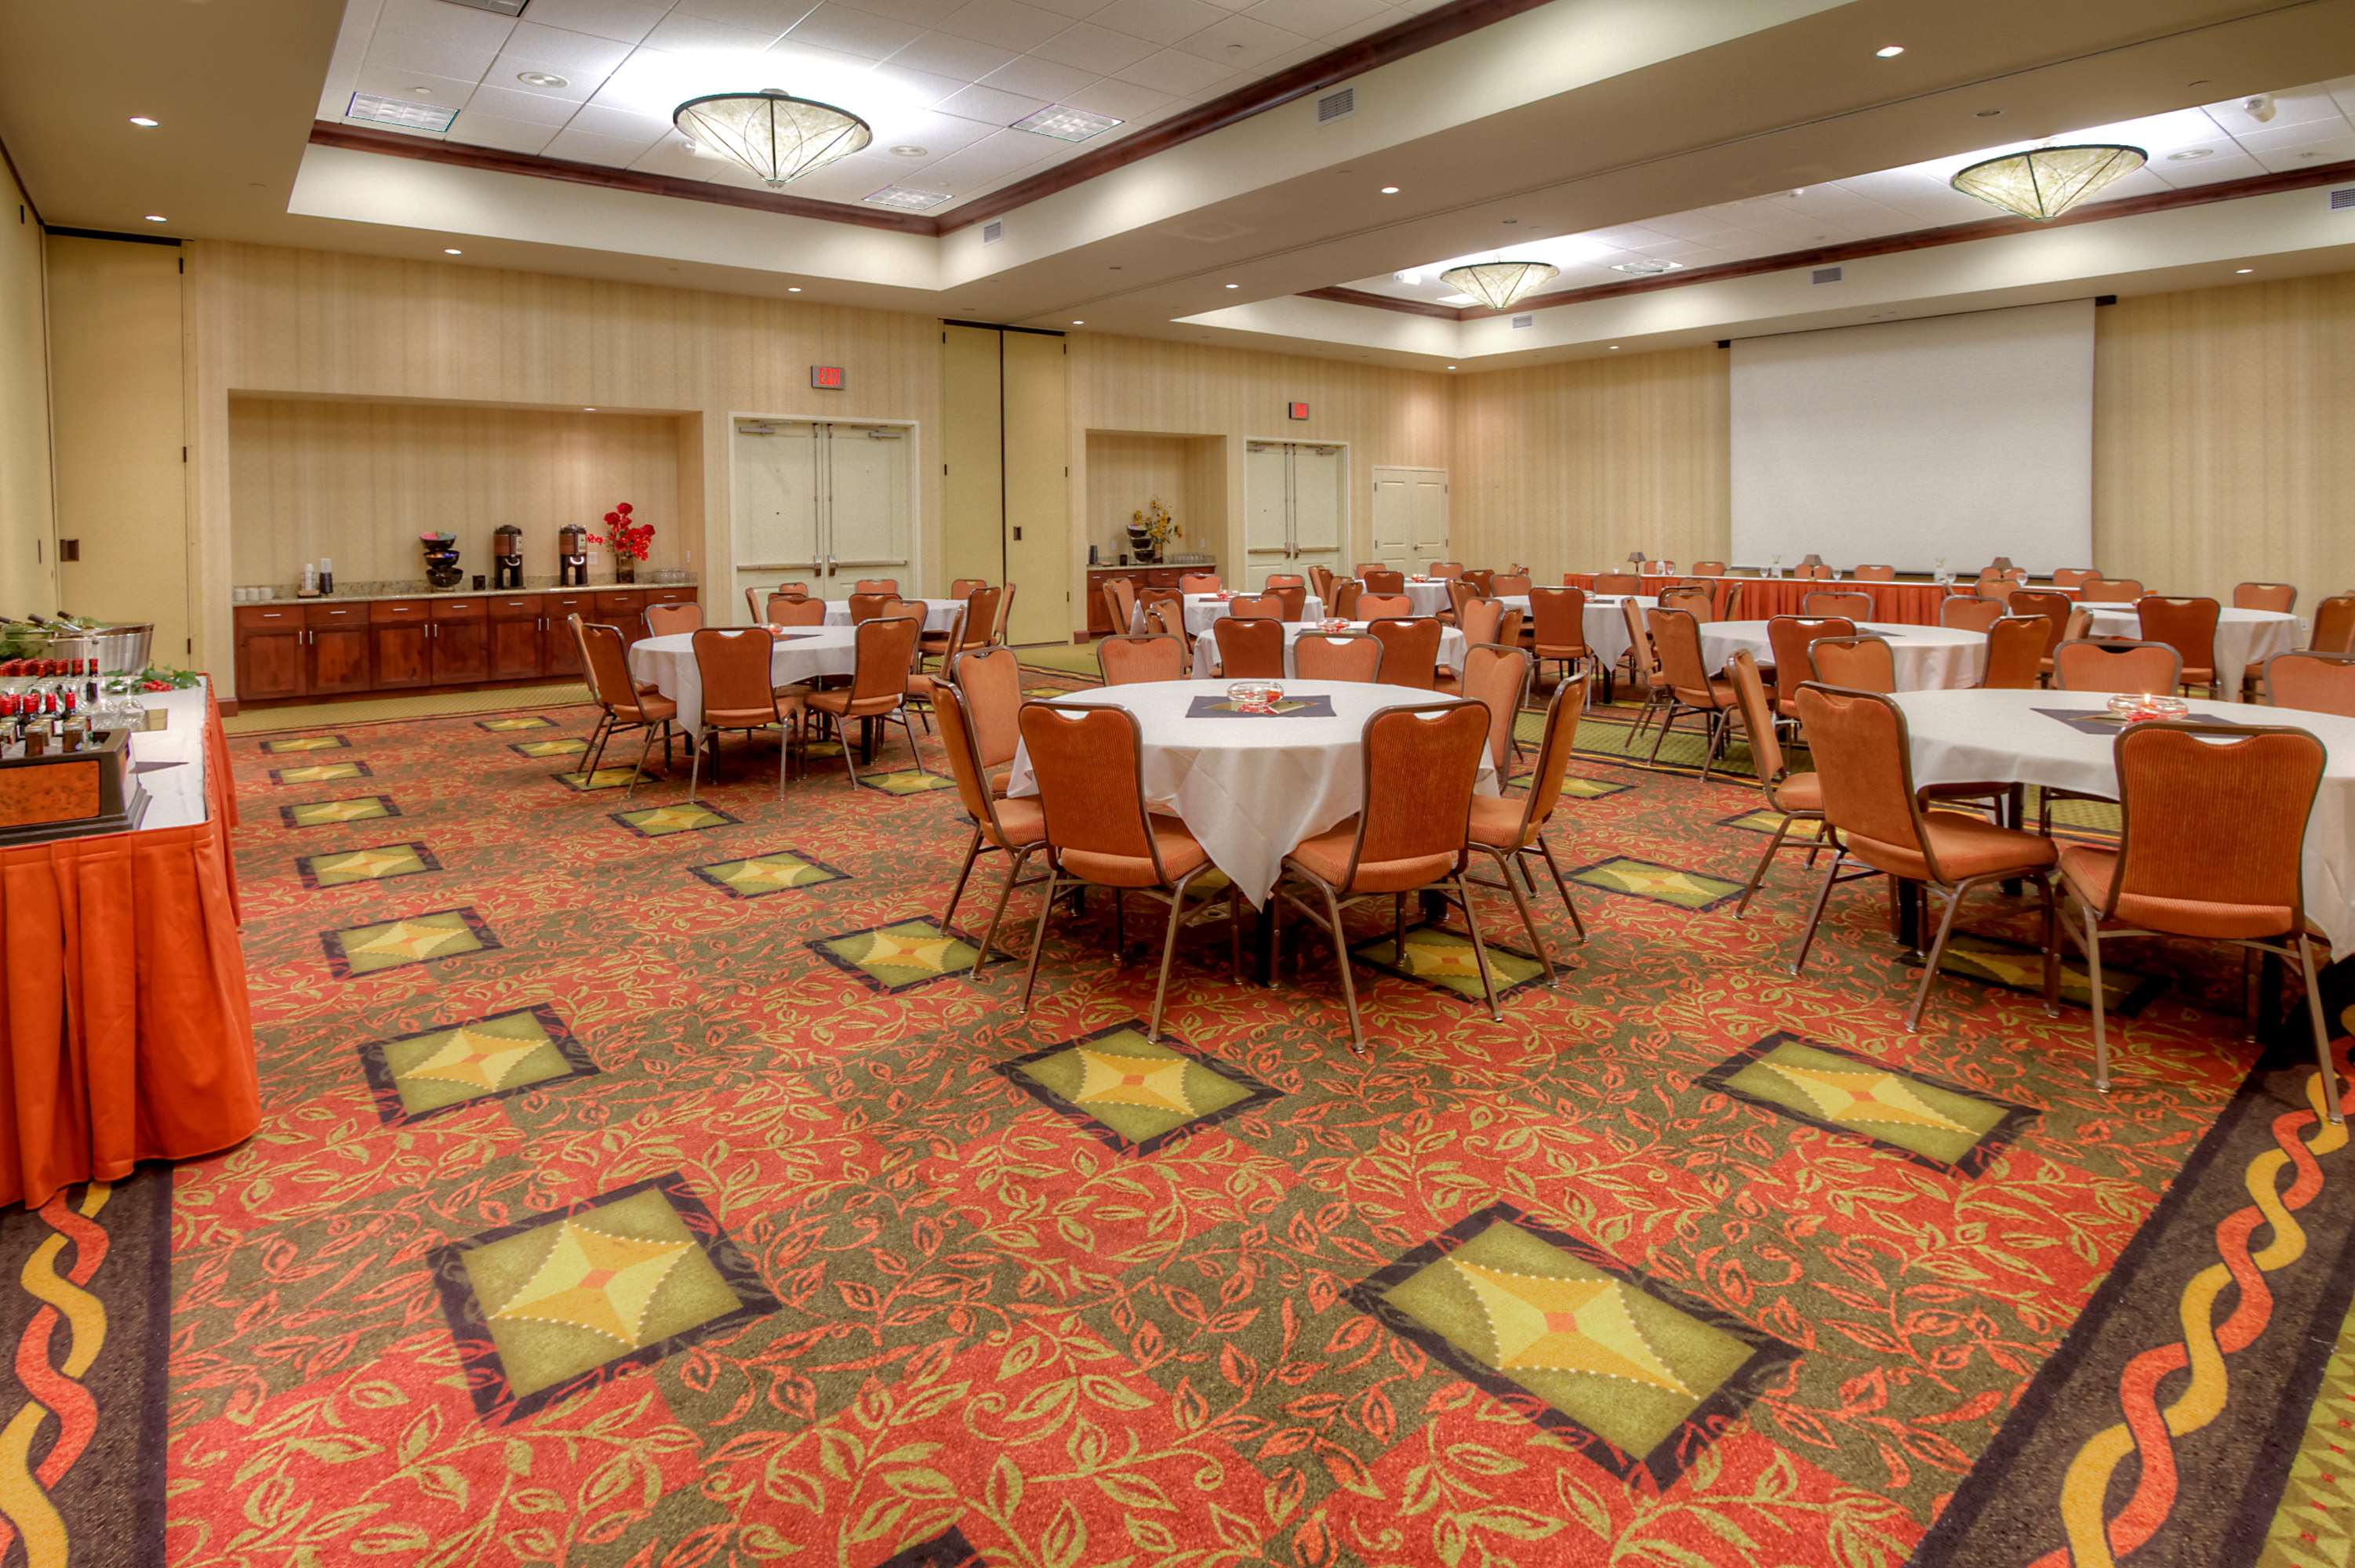 Hilton Garden Inn Great Falls image 21